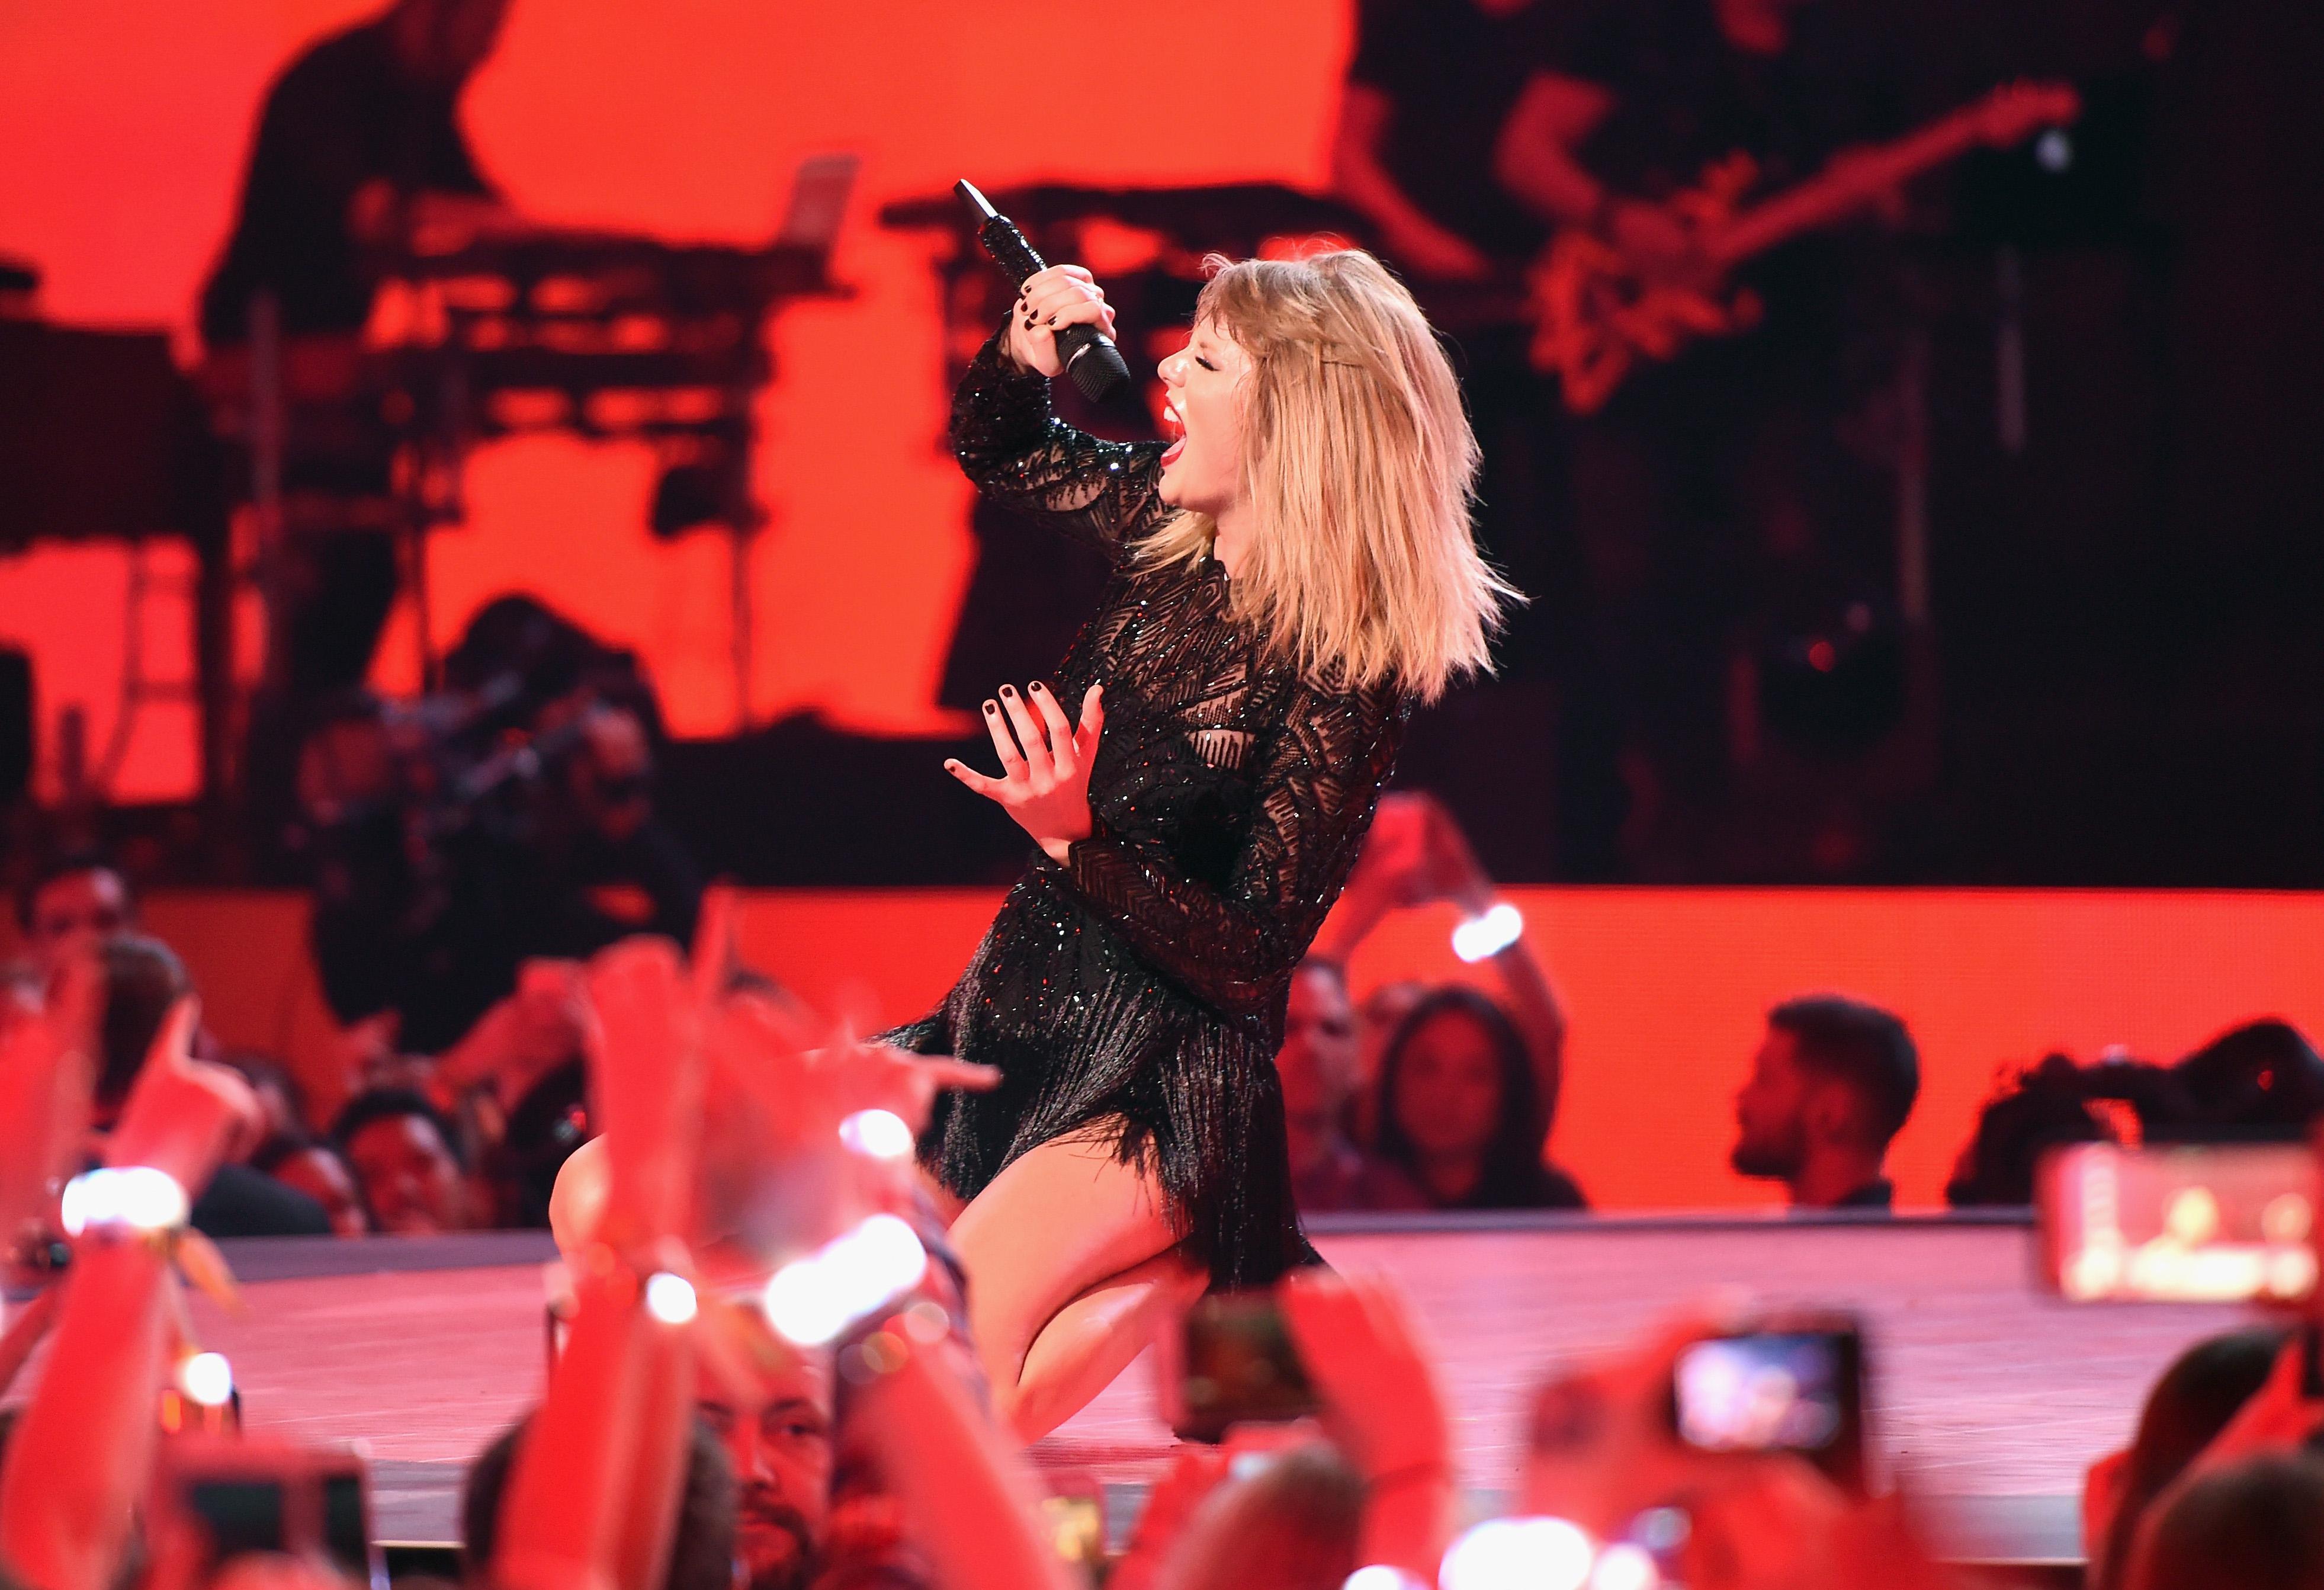 Taylor-Swifts-Music-Returning-To-Spotify-Pandora